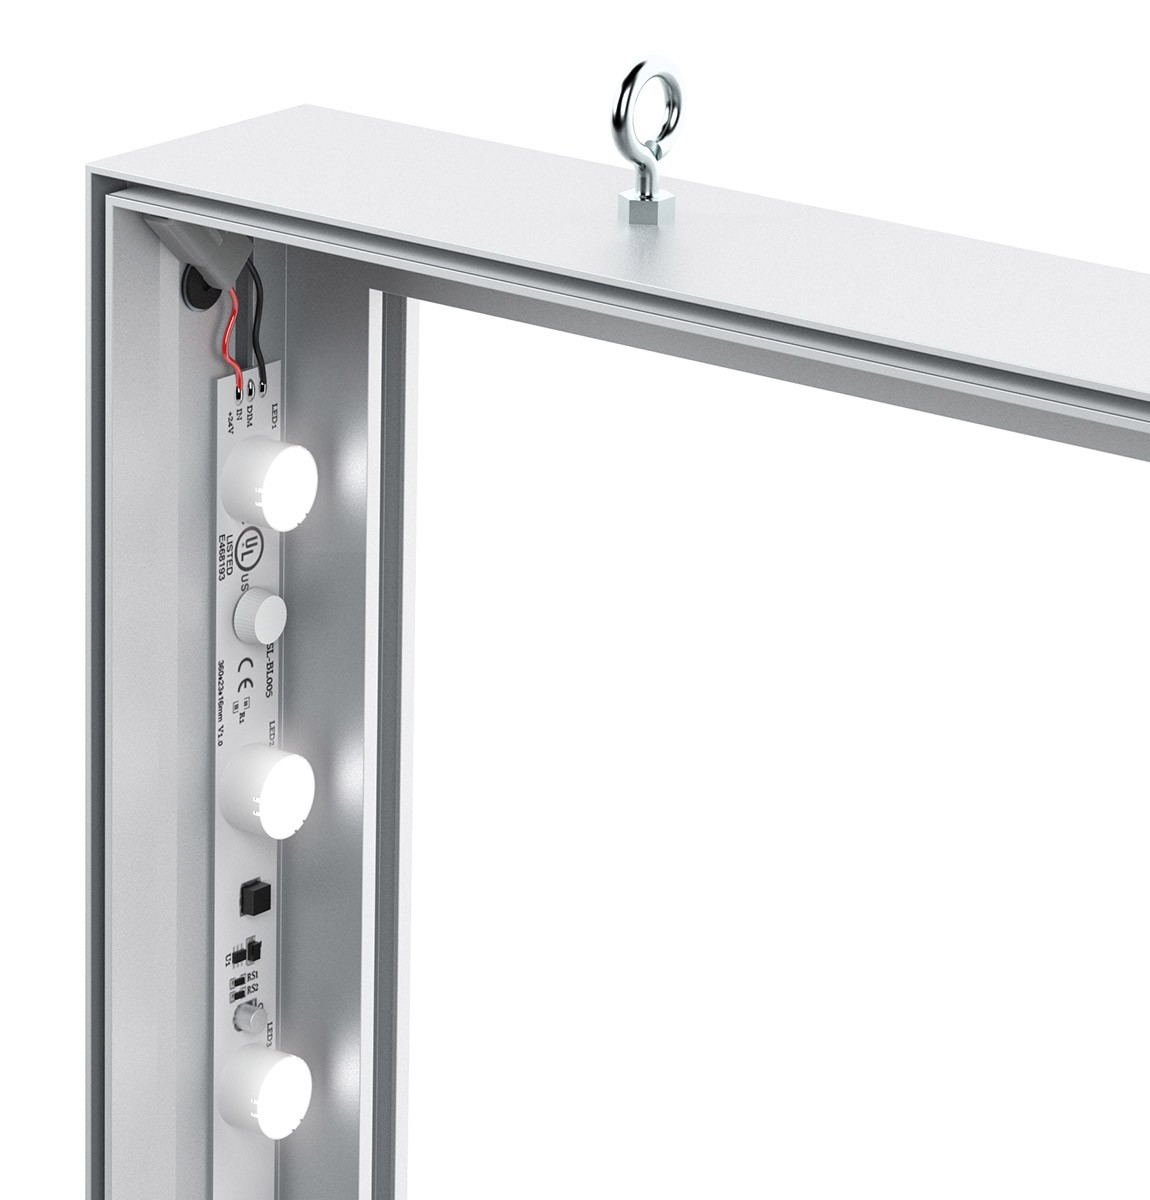 Charisma 60x96 Slim LED SEG Fabric Light Box